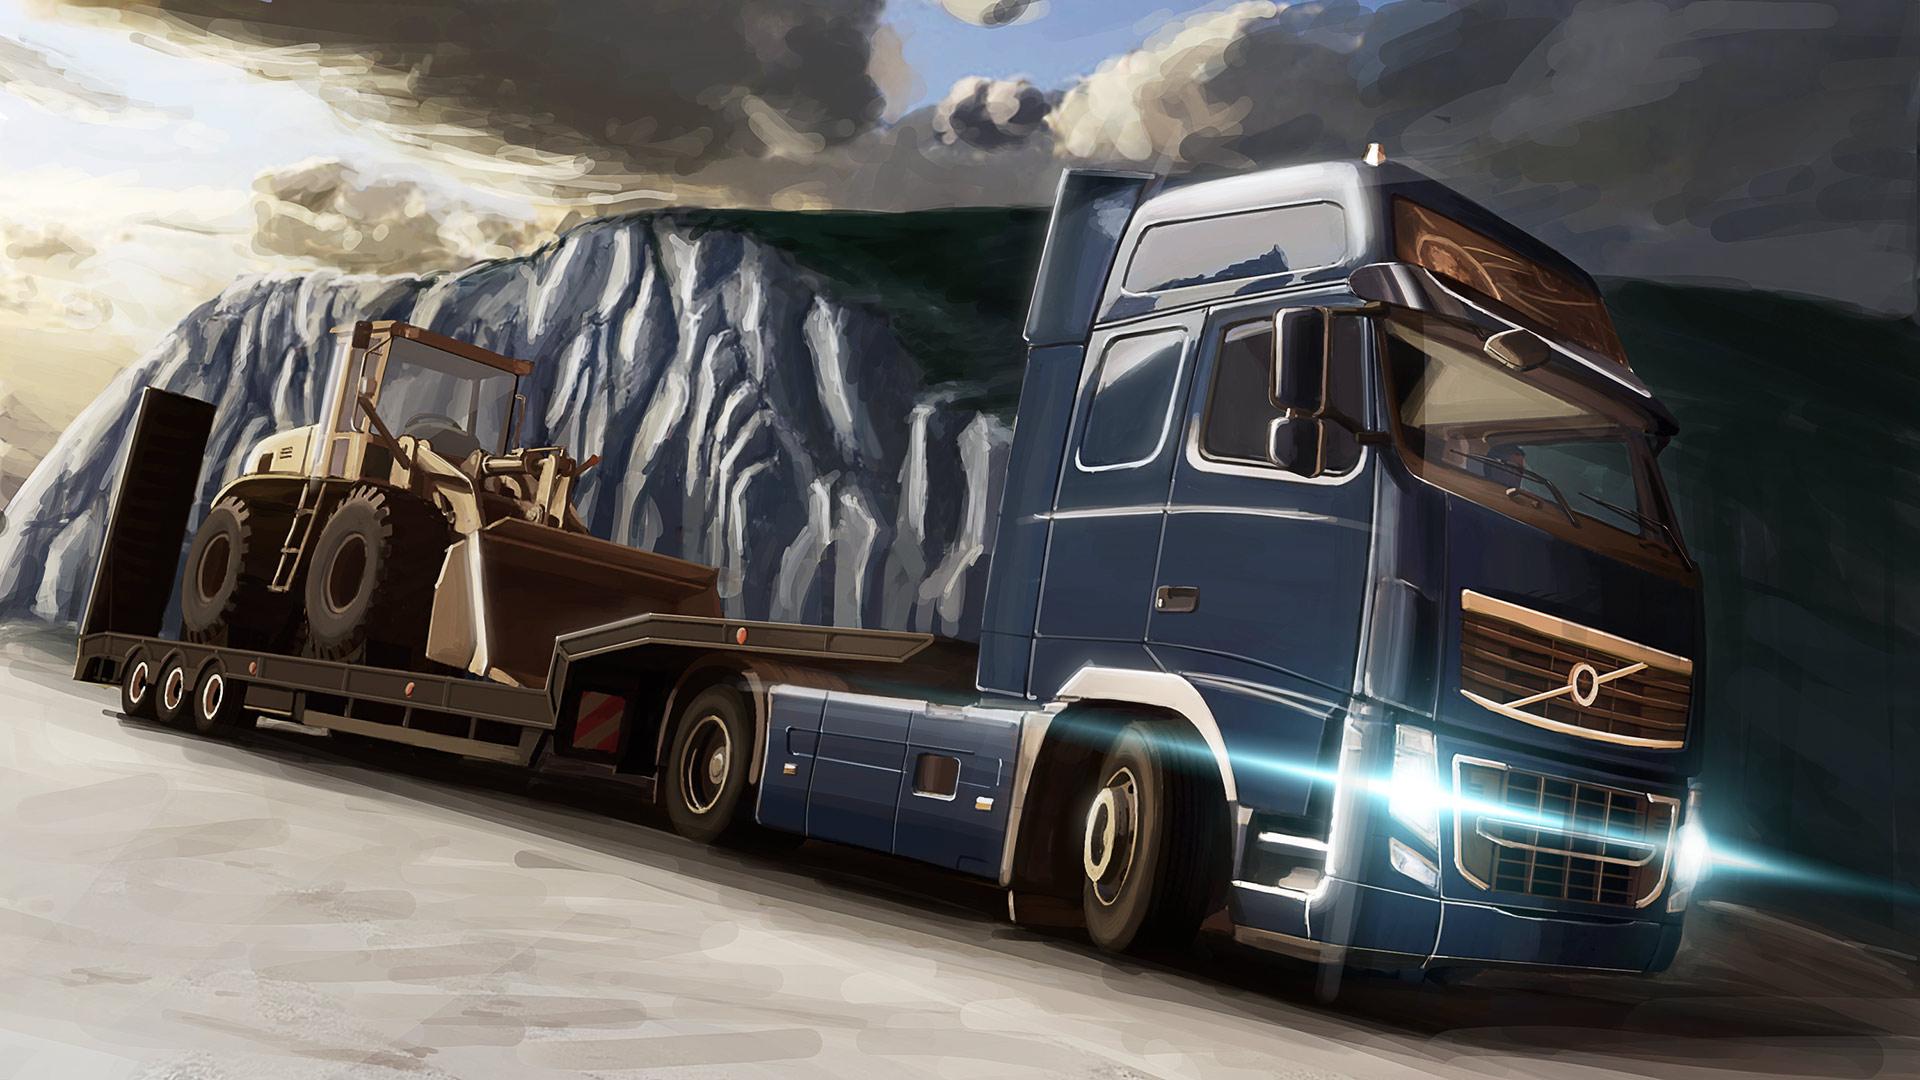 Game euro truck simulator 2 tractor semi rigs rig d wallpaper 1920x1080